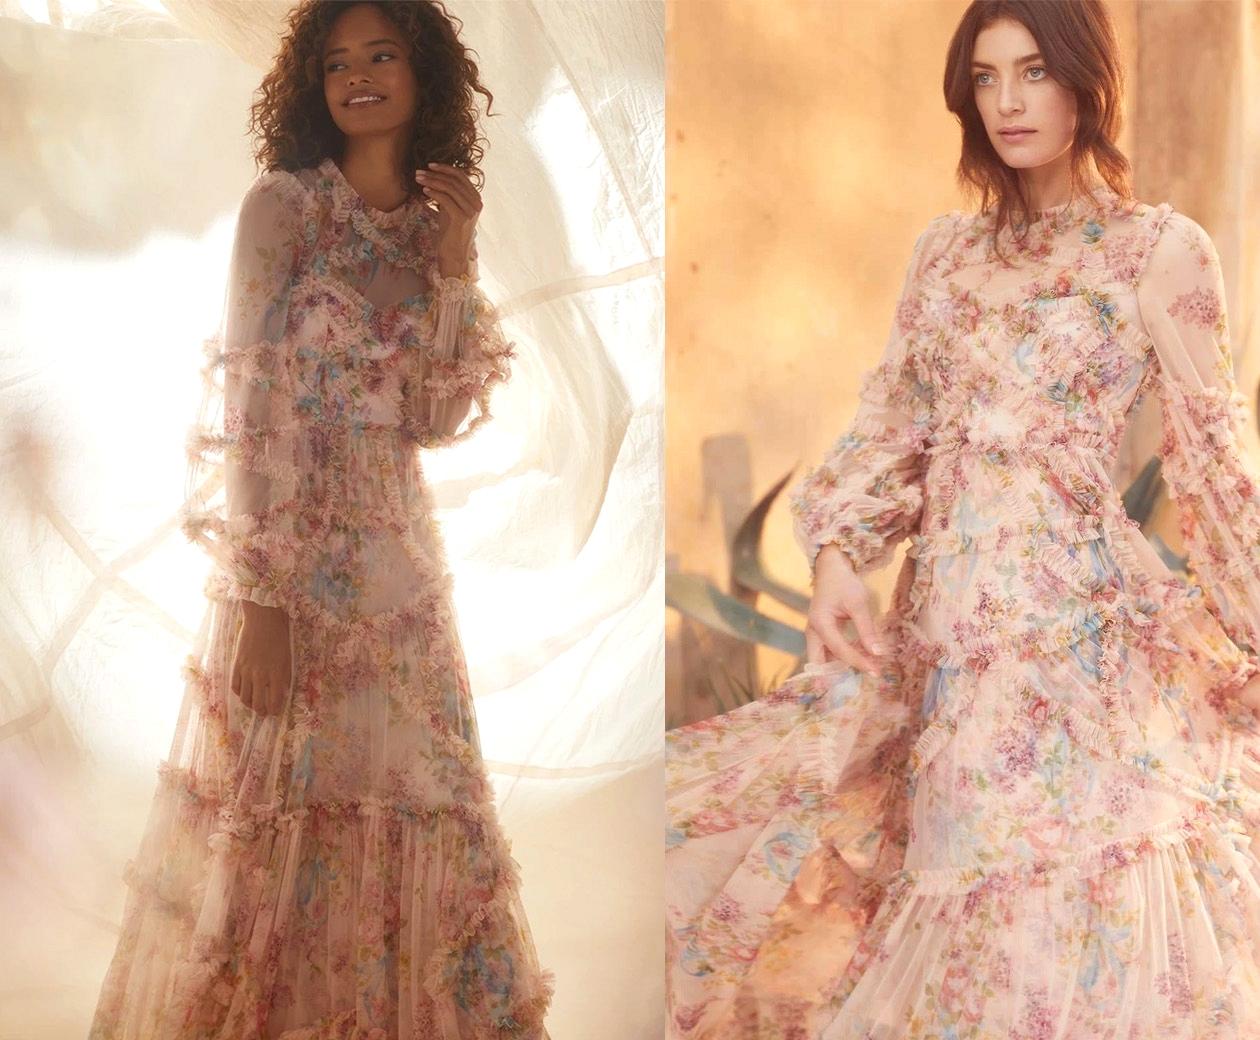 peach floral wedding dress